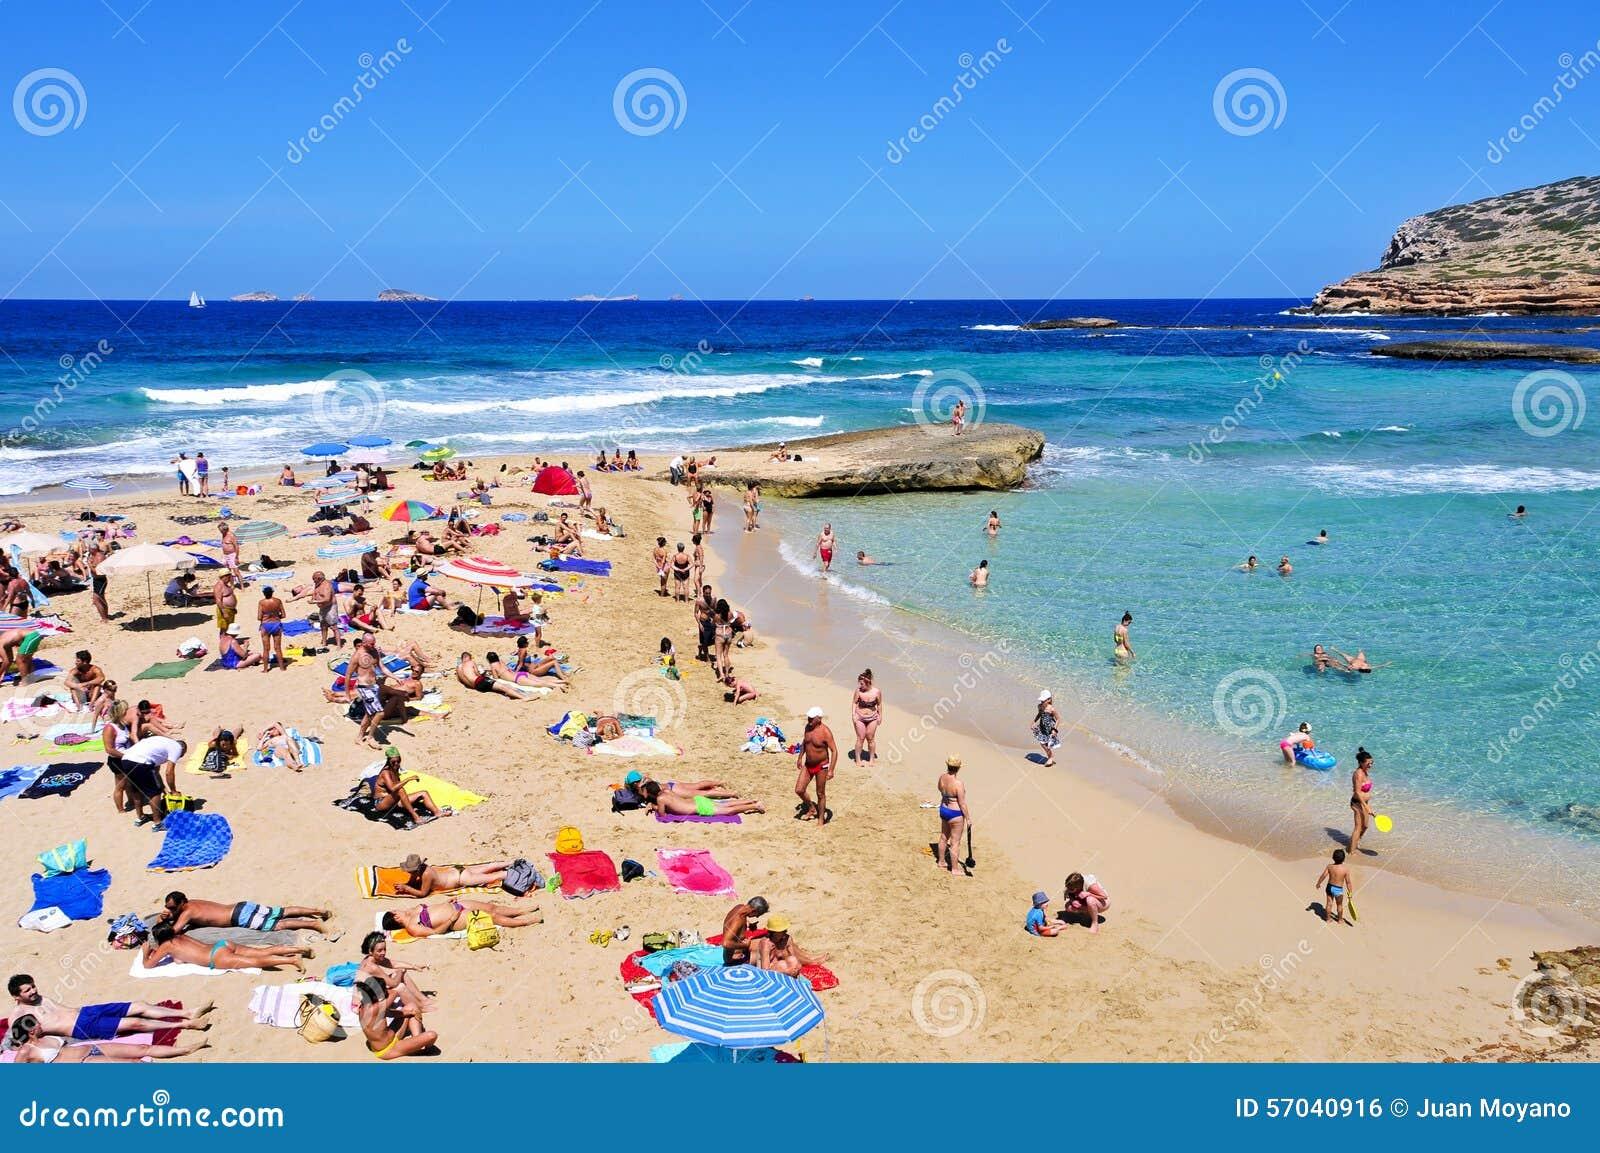 Sunbathers At Cala Conta Beach In San Antonio, Ibiza Island